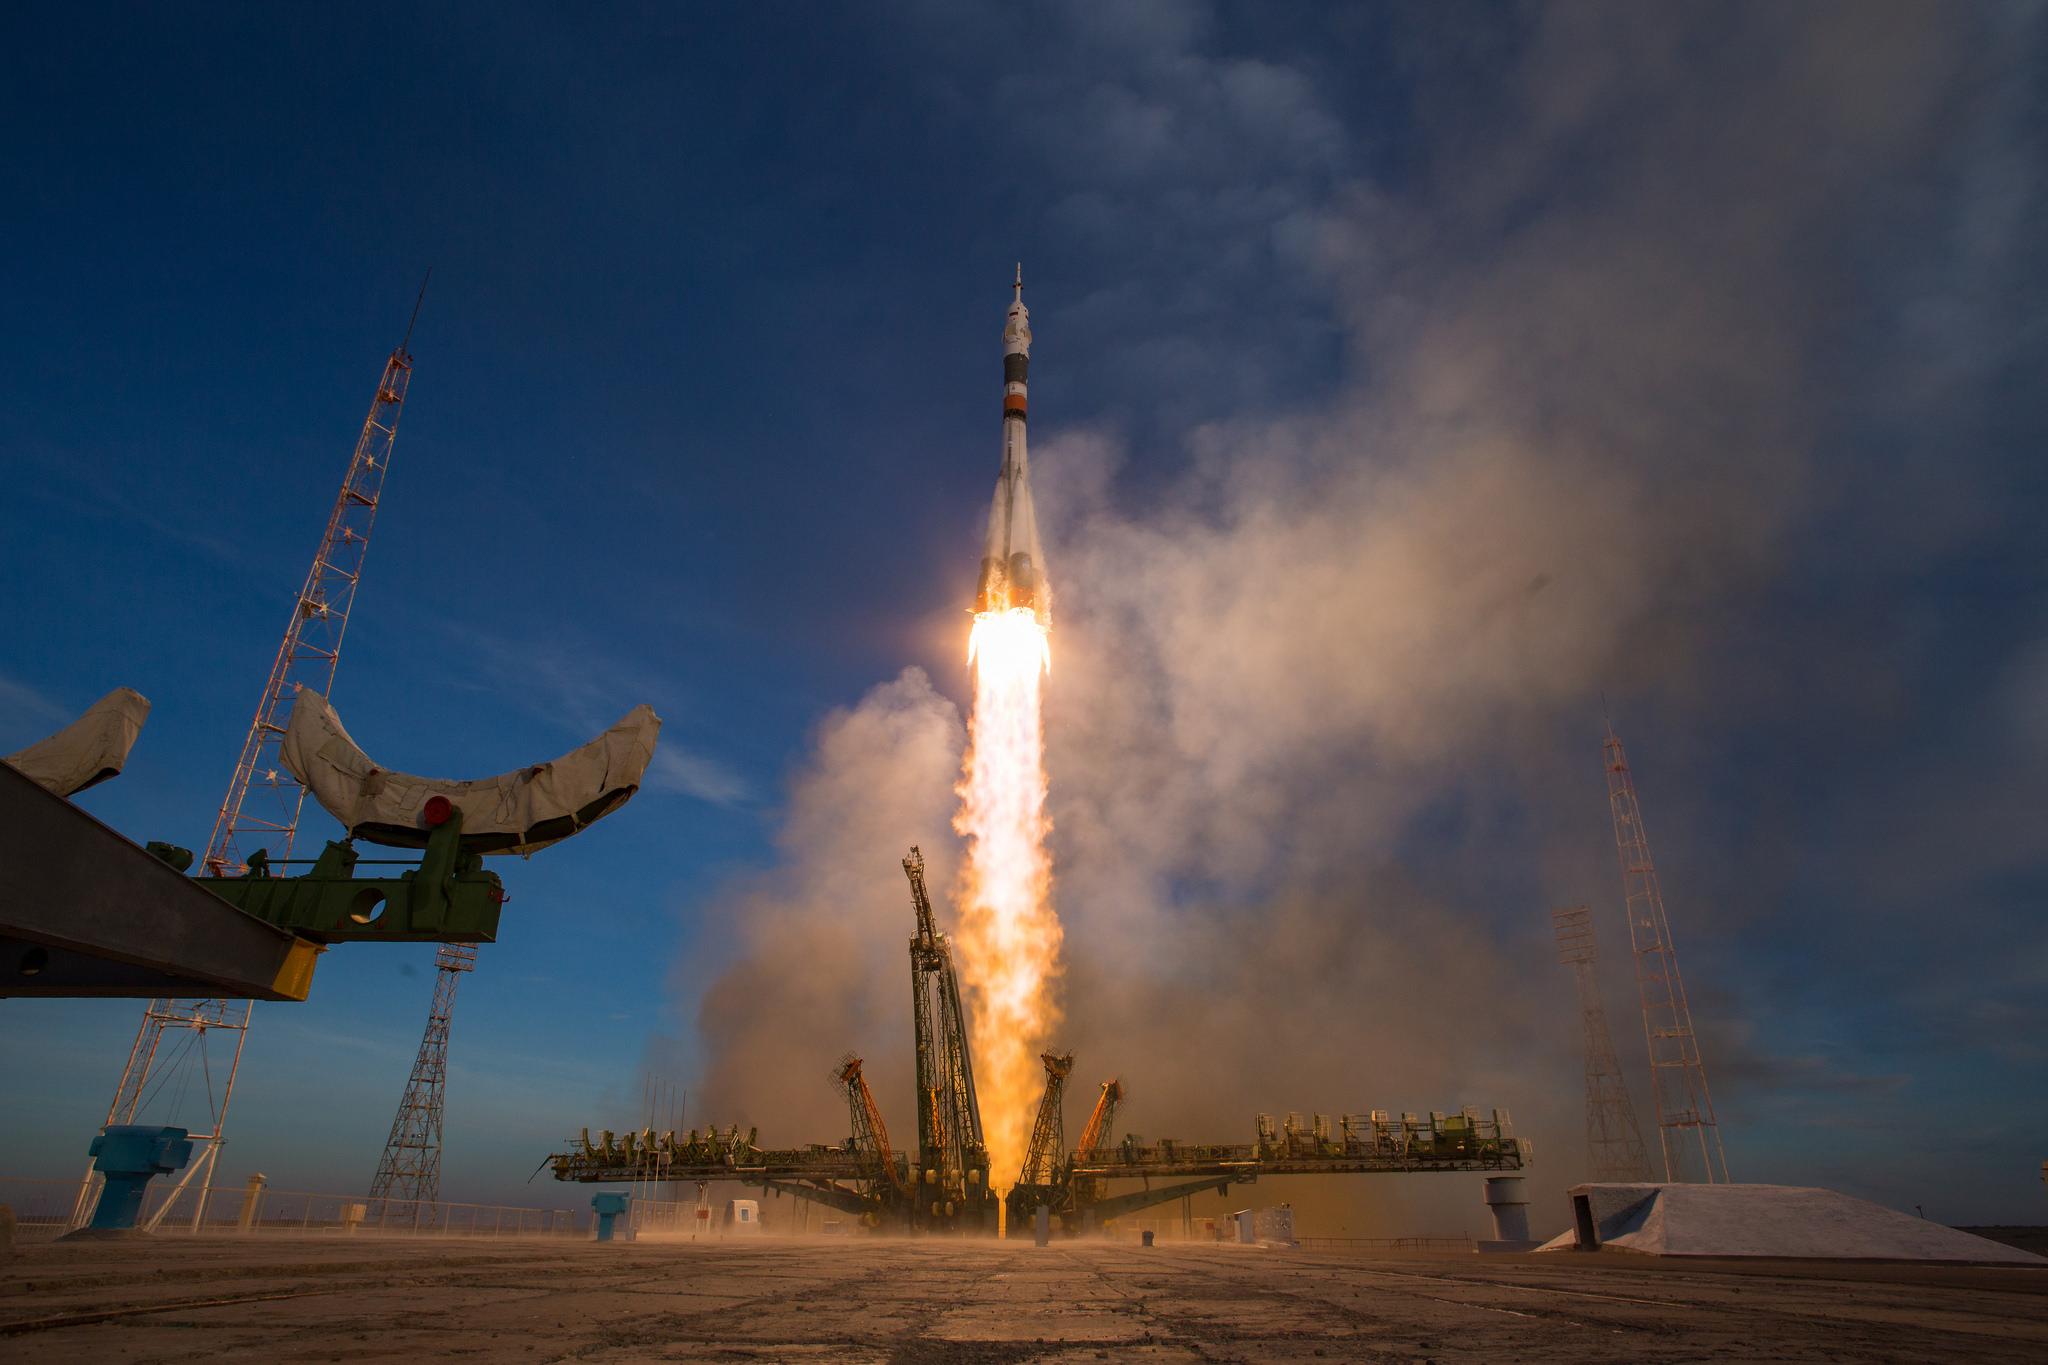 A Soyuz-FG rocket launches the Soyuz MS-11 spacecraft into orbit with three fresh crew members for the International Space Station. Credit: NASA/Aubrey Gemignani